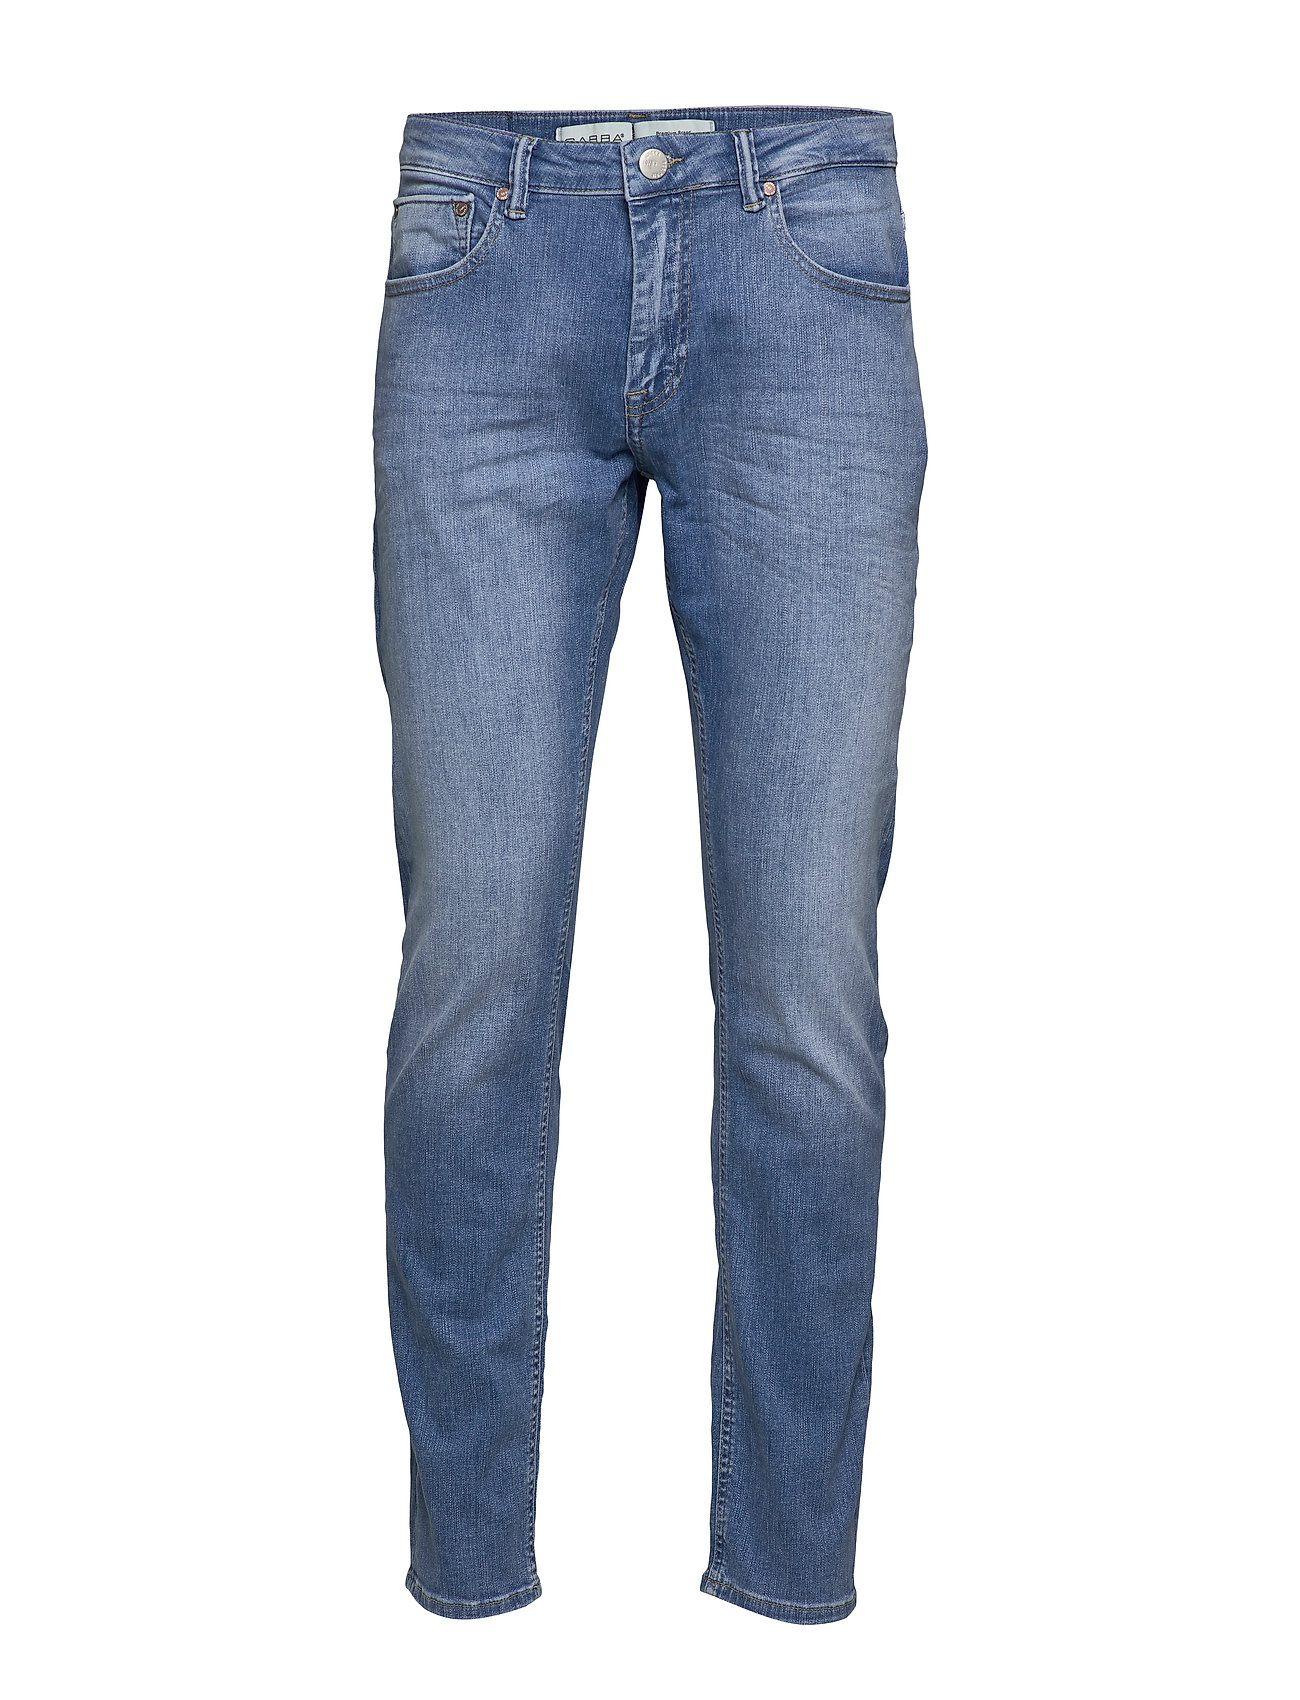 Image of J S K2615 Lt. Slim Jeans Blå Gabba (3292990547)